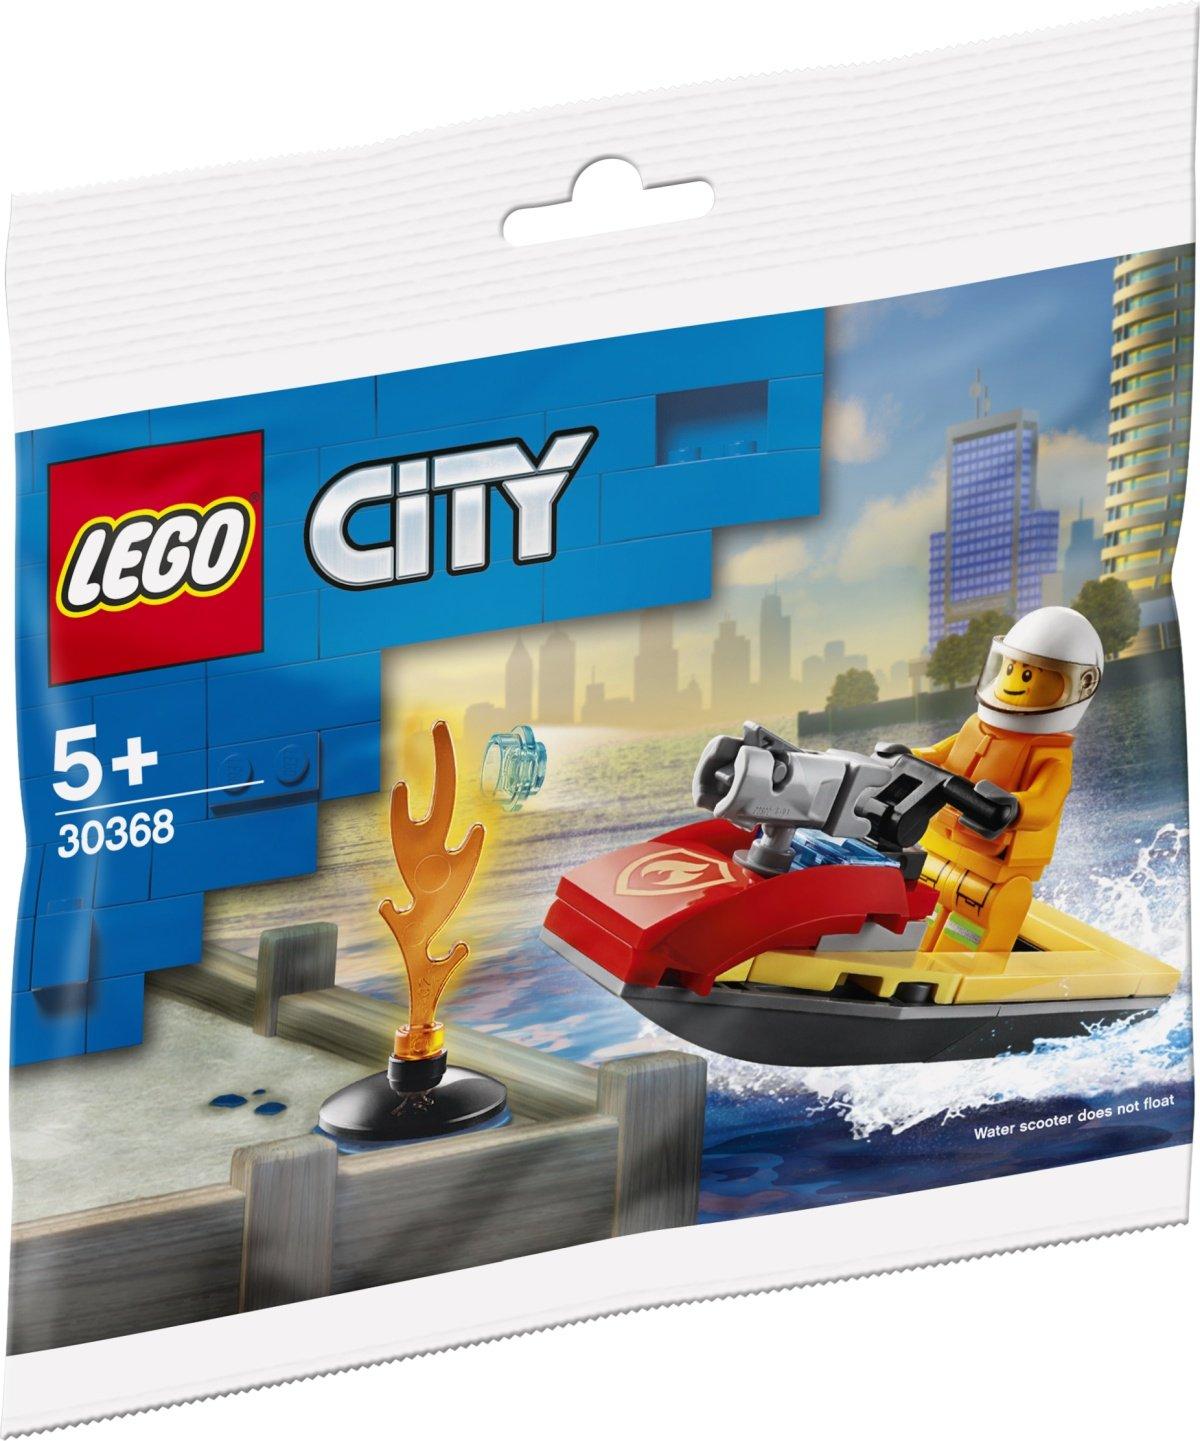 lego-polybag-city-30368-0001